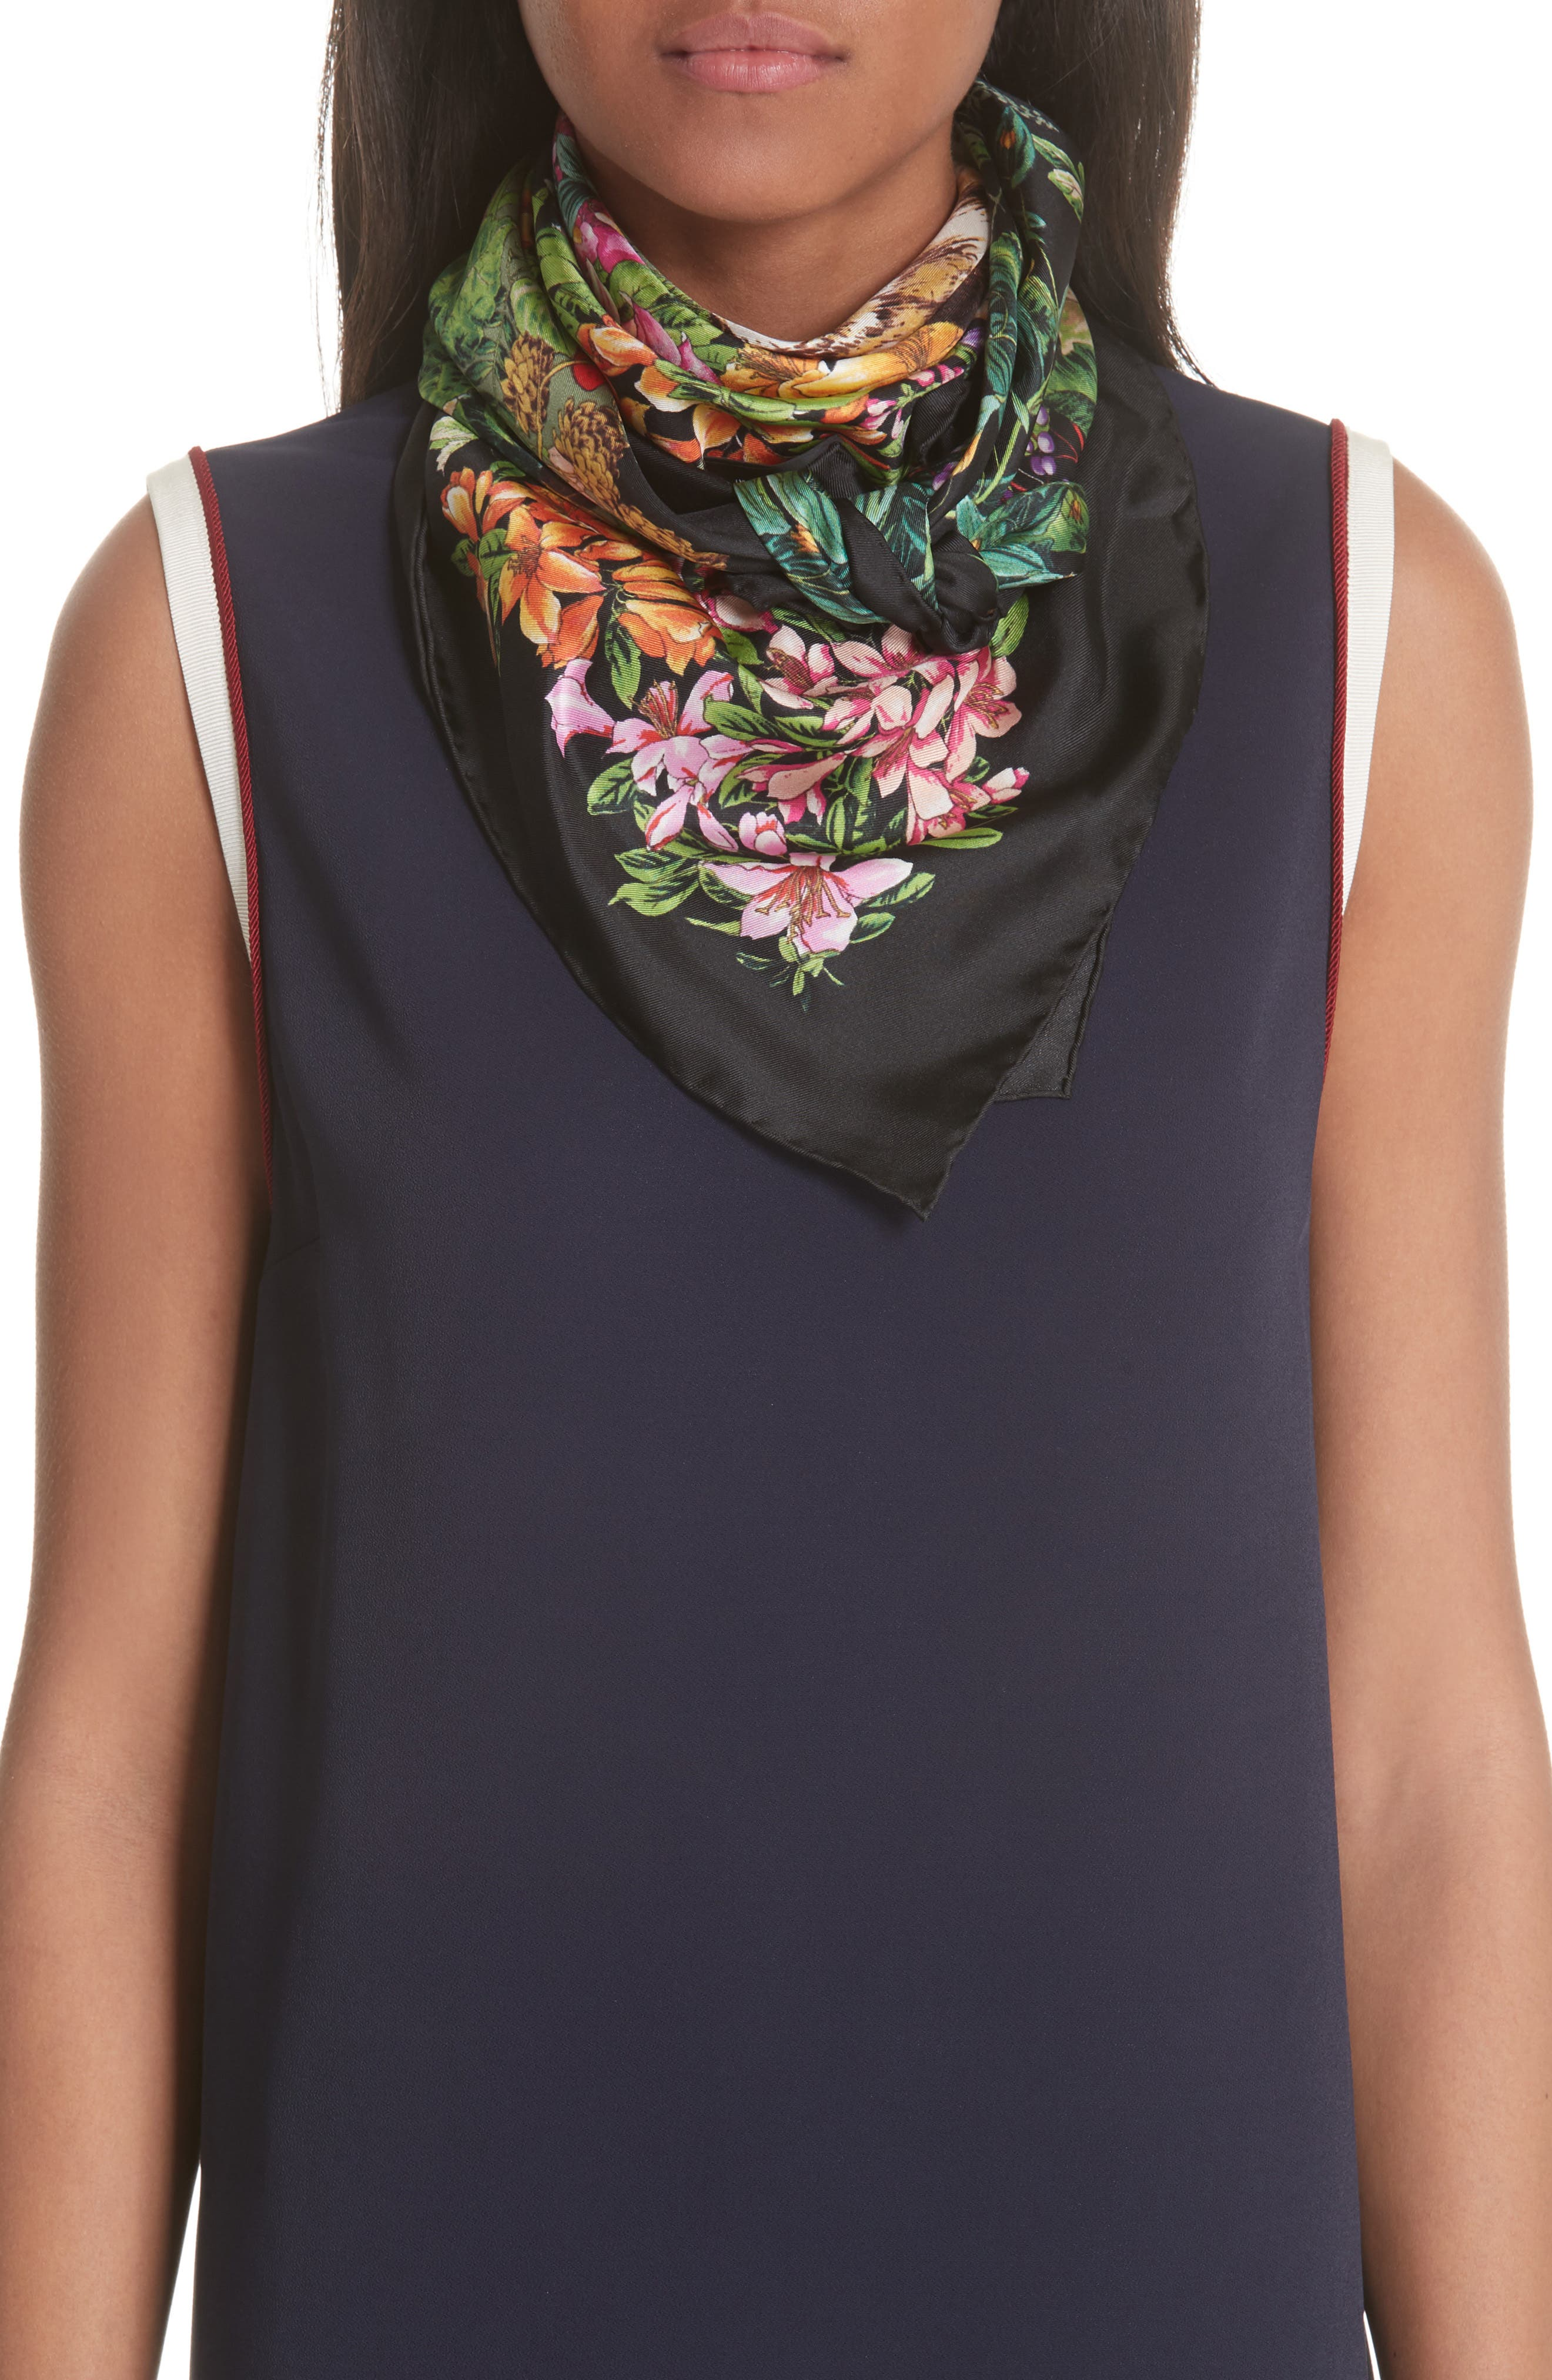 Flower Deer Foulard Silk Twill Scarf,                             Alternate thumbnail 2, color,                             BLACK/ MULTICOLOR